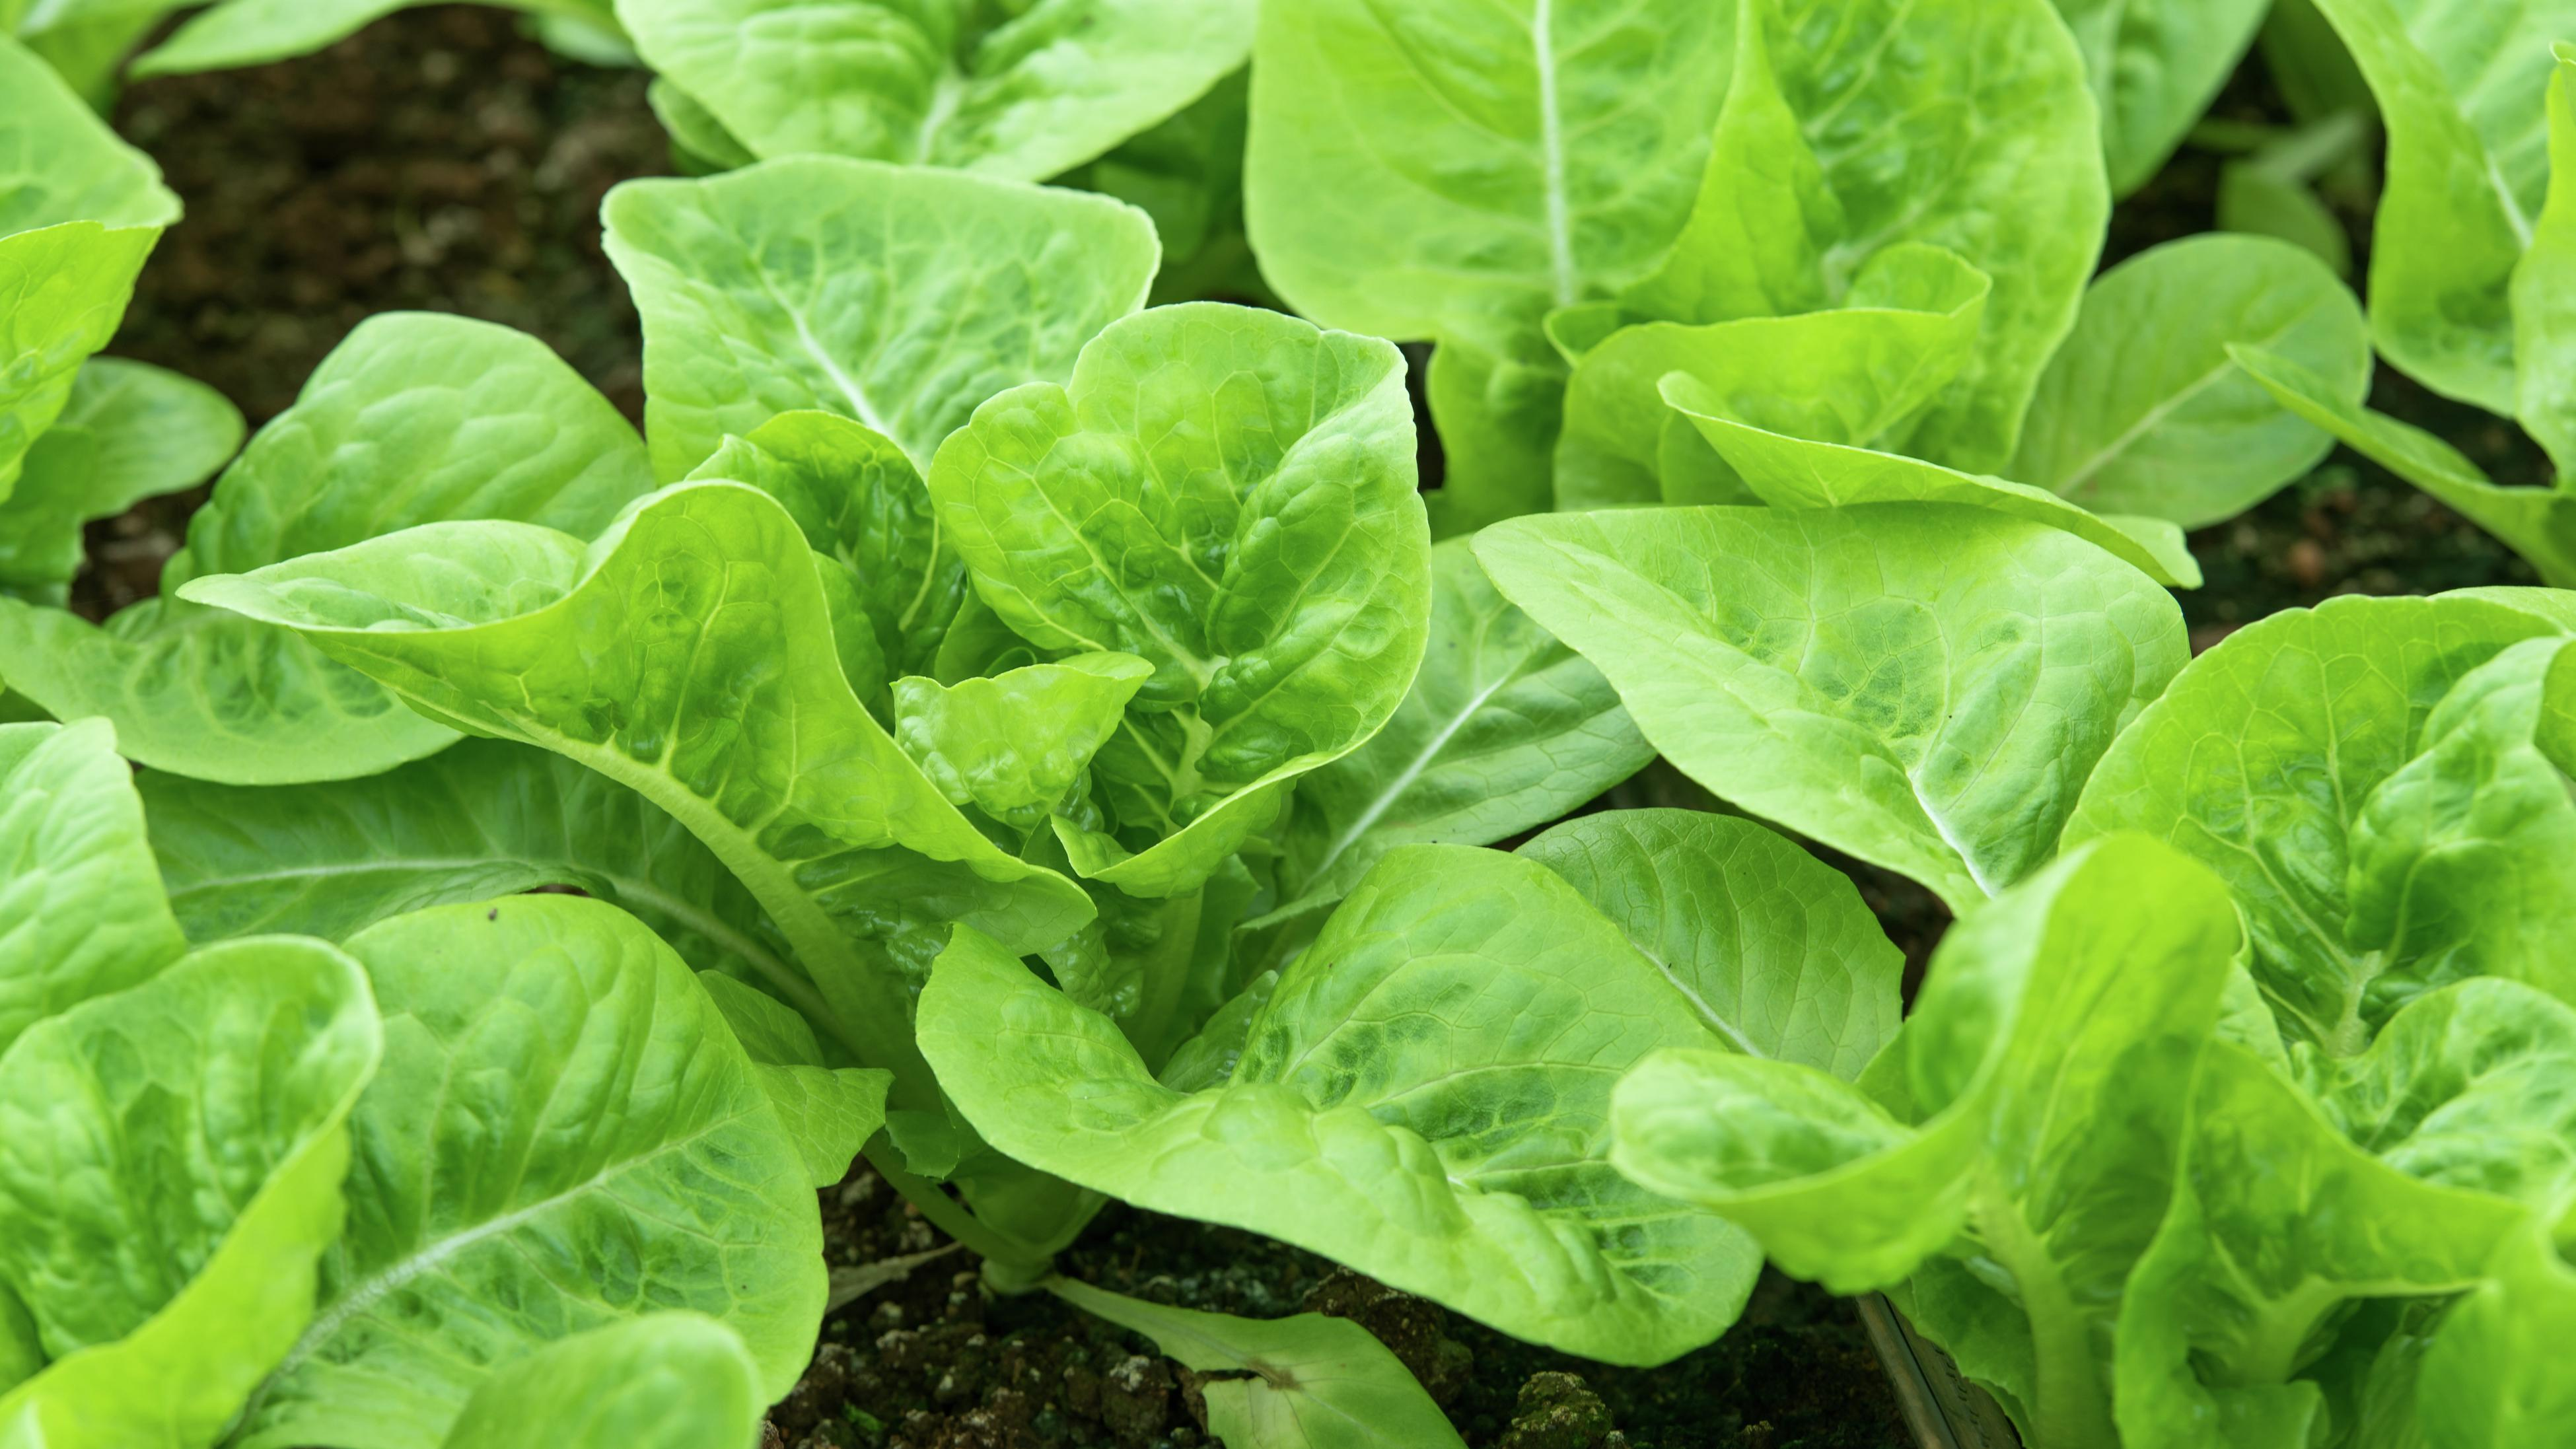 Fresh cos lettuce growing in a vegetable garden